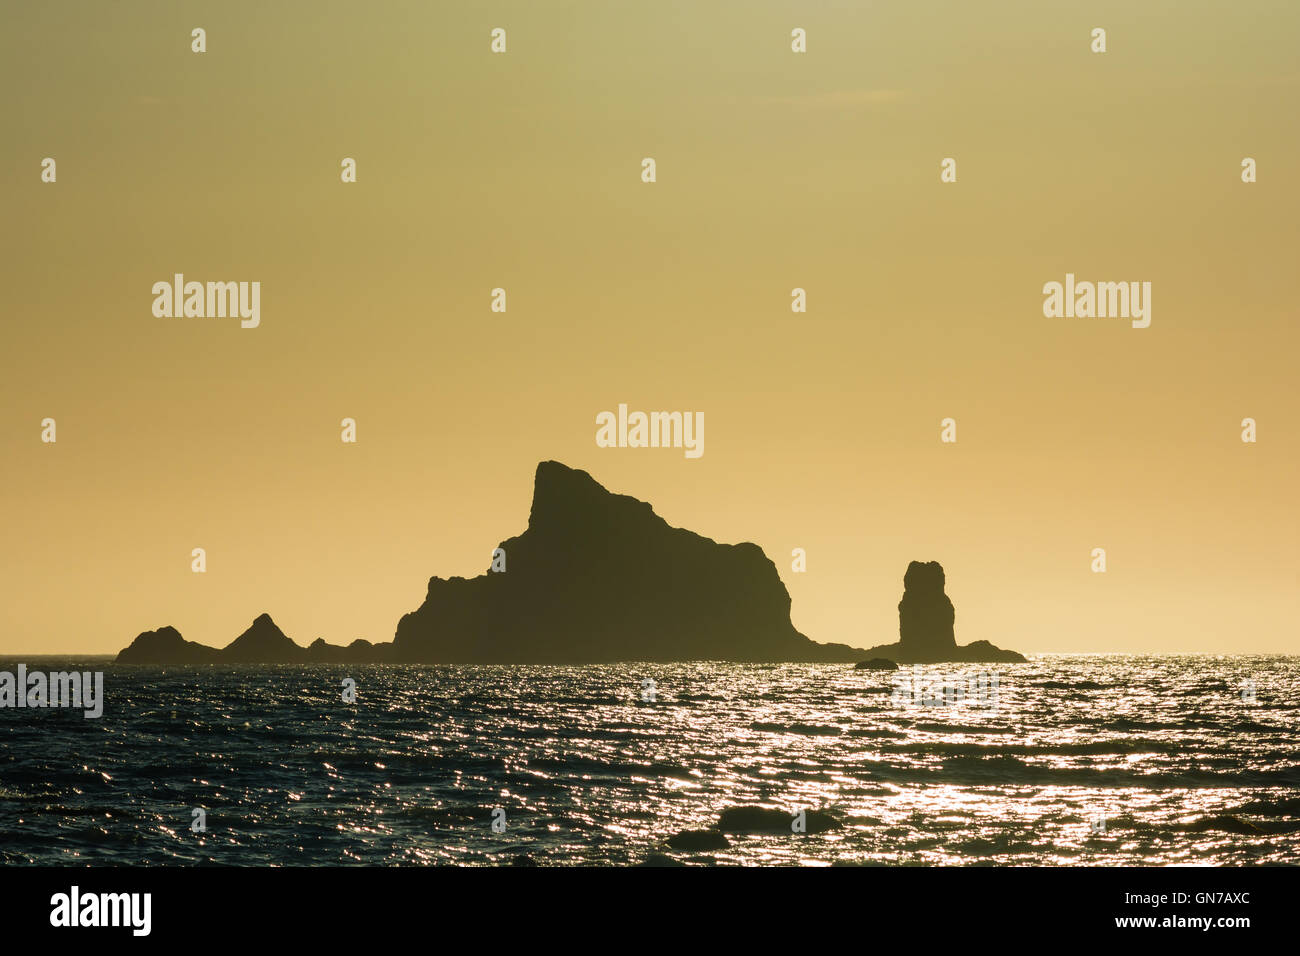 Islands at sunset at Rialto Beach in Olympic National Park, Washington, US Stock Photo